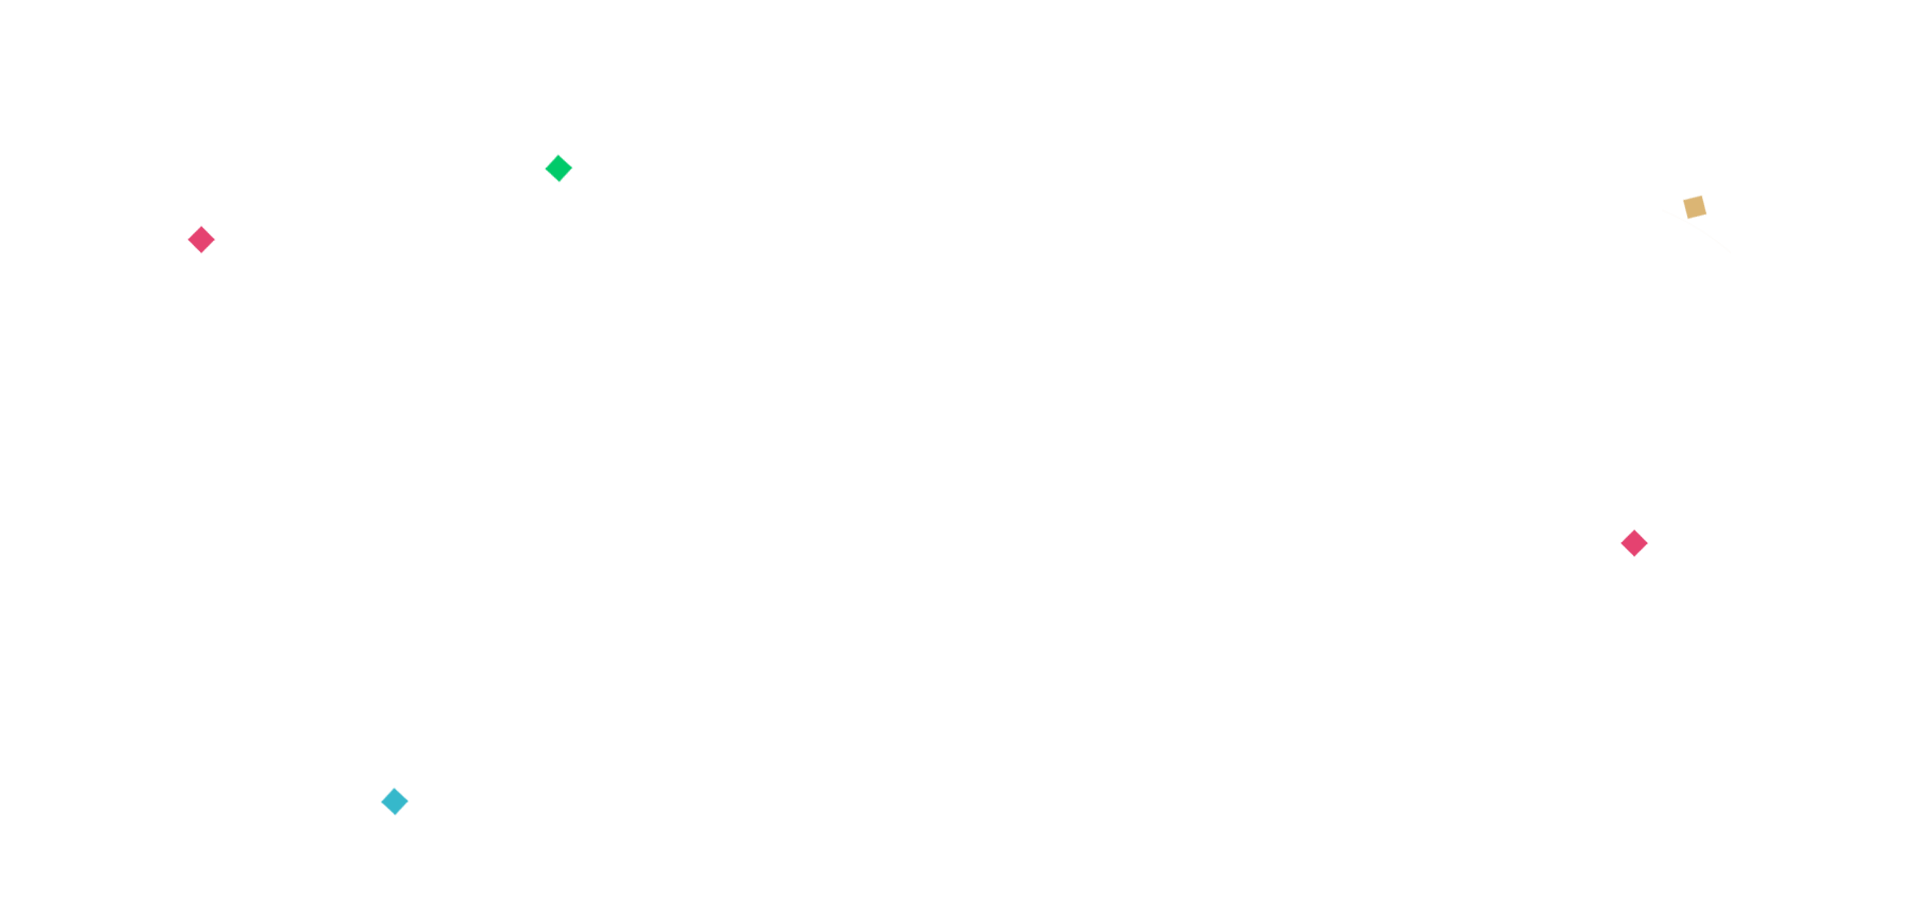 pattern_background1